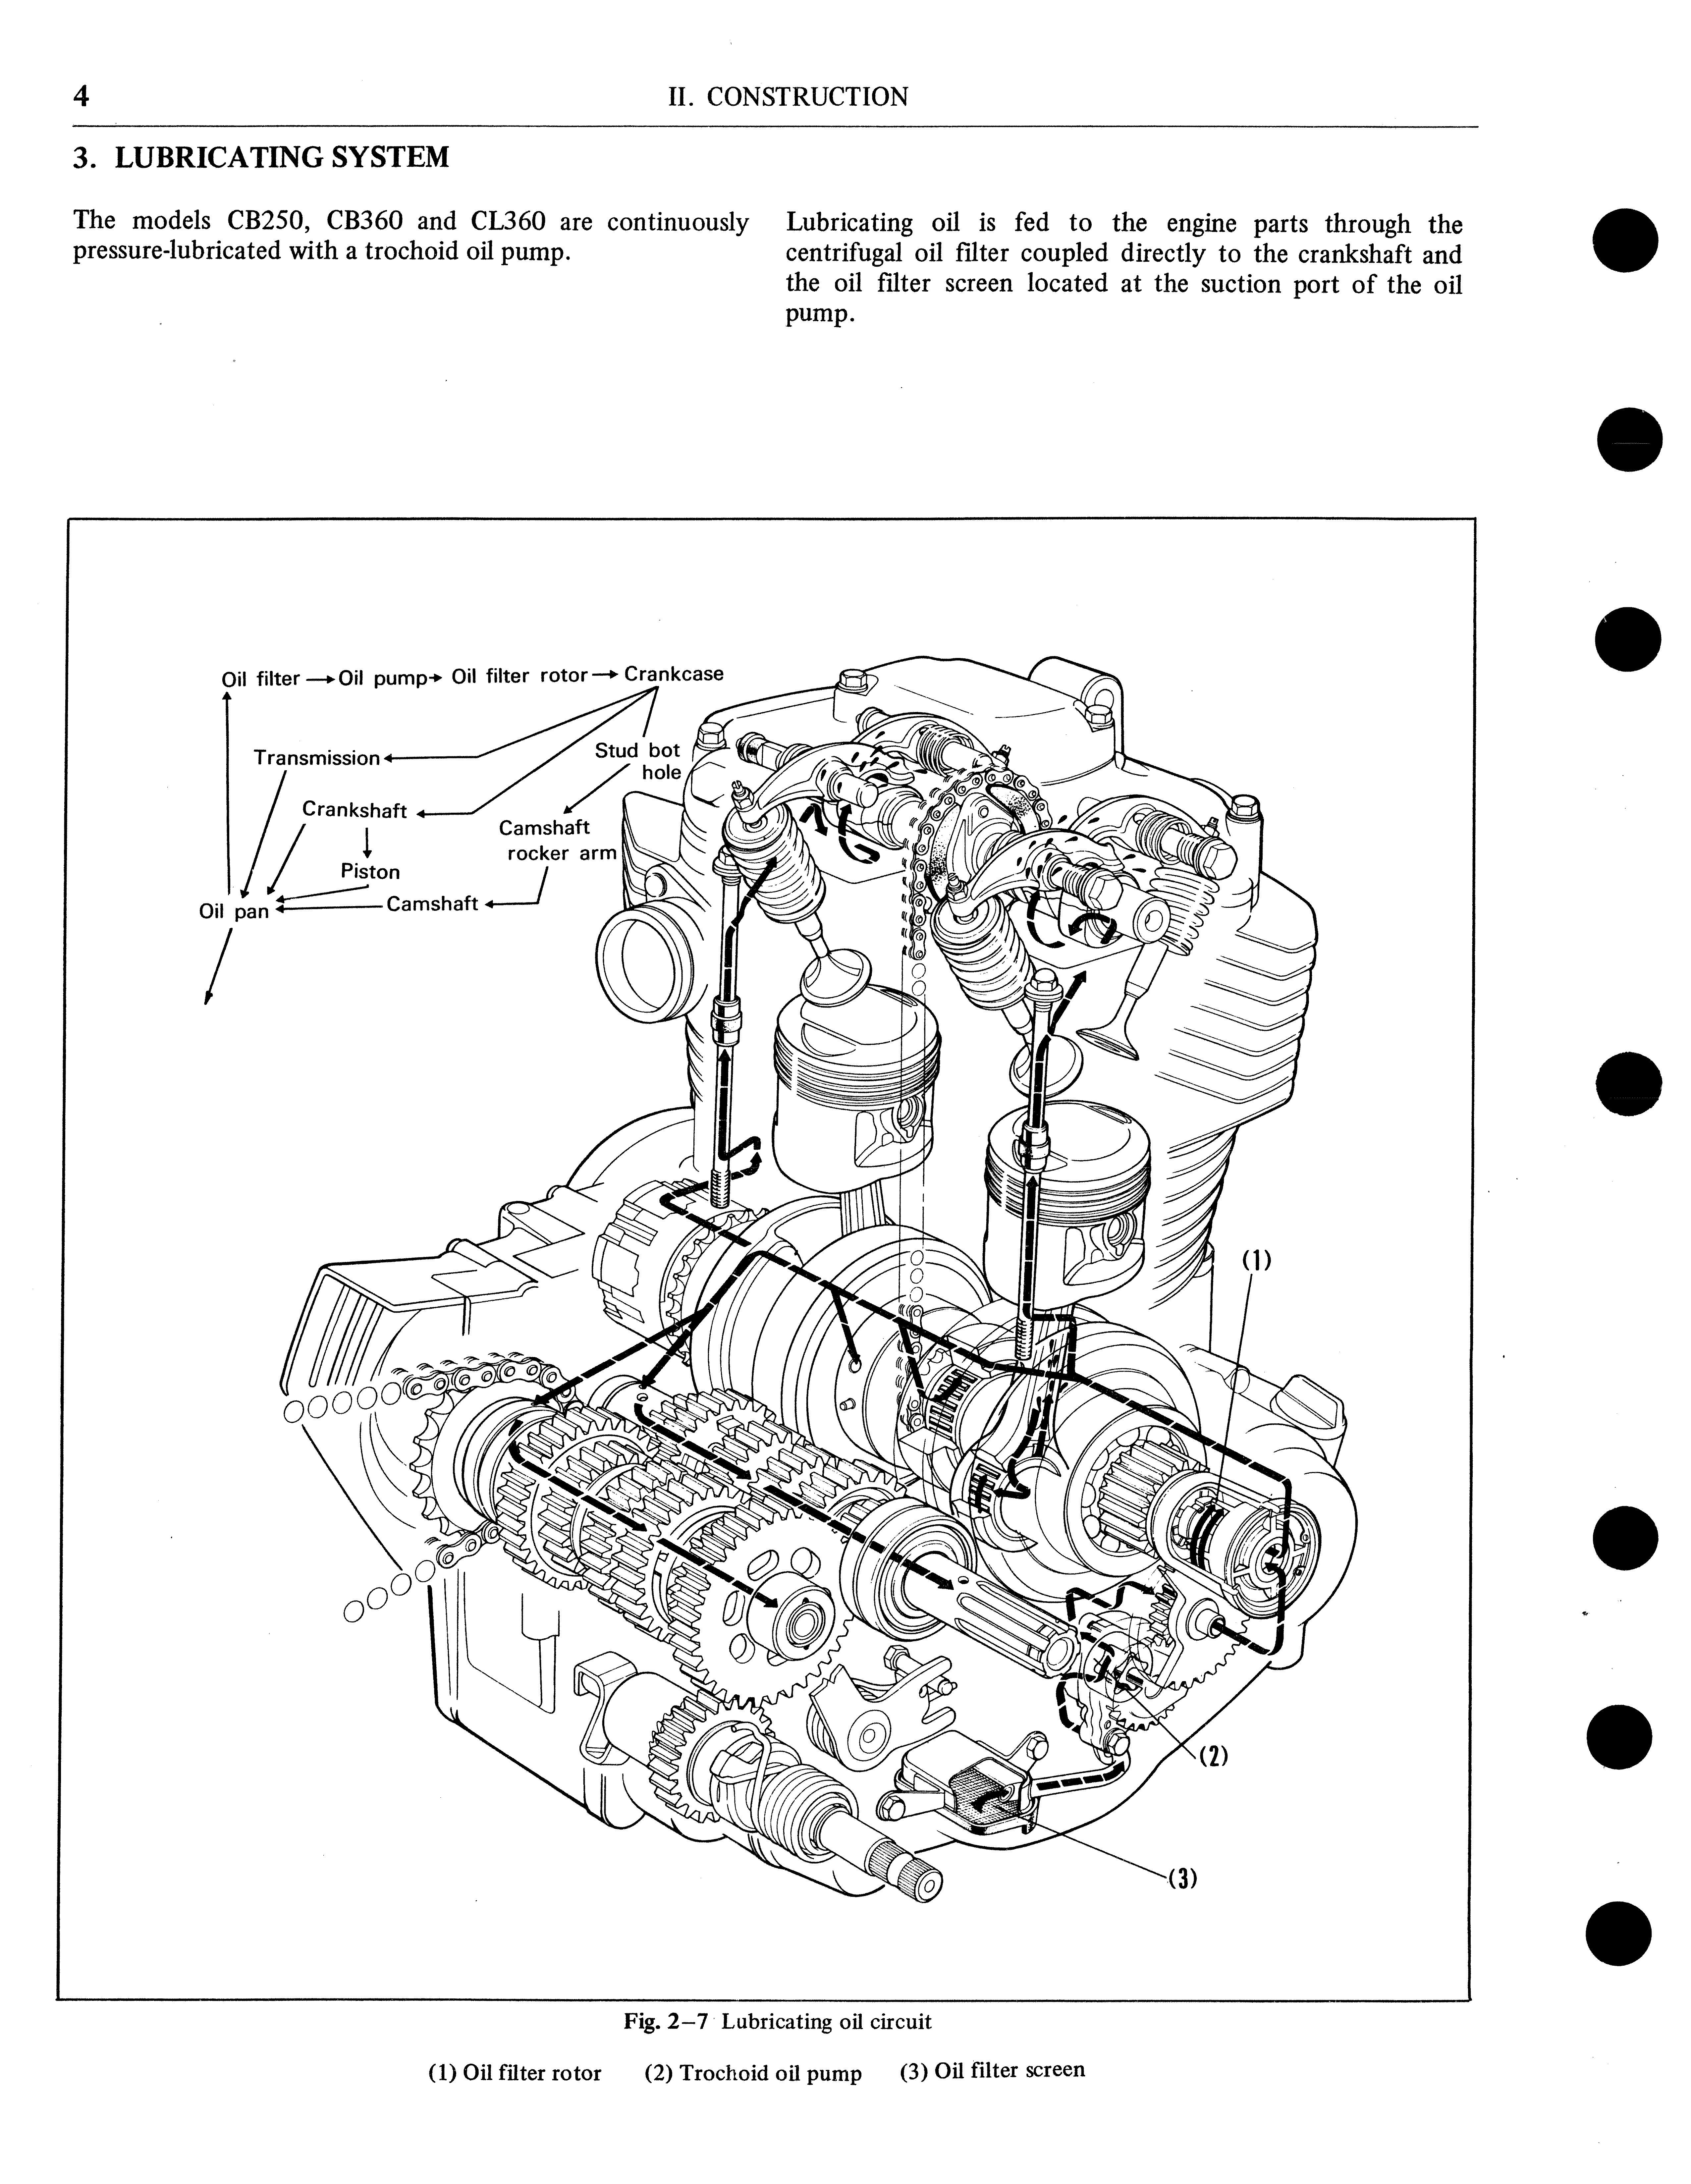 CB360T OIL STARVATION 2 BROKEN OIL PUMPS - NEED NEW HEAD+ Oil Pump+  tensioner | Honda TwinsHonda Twins